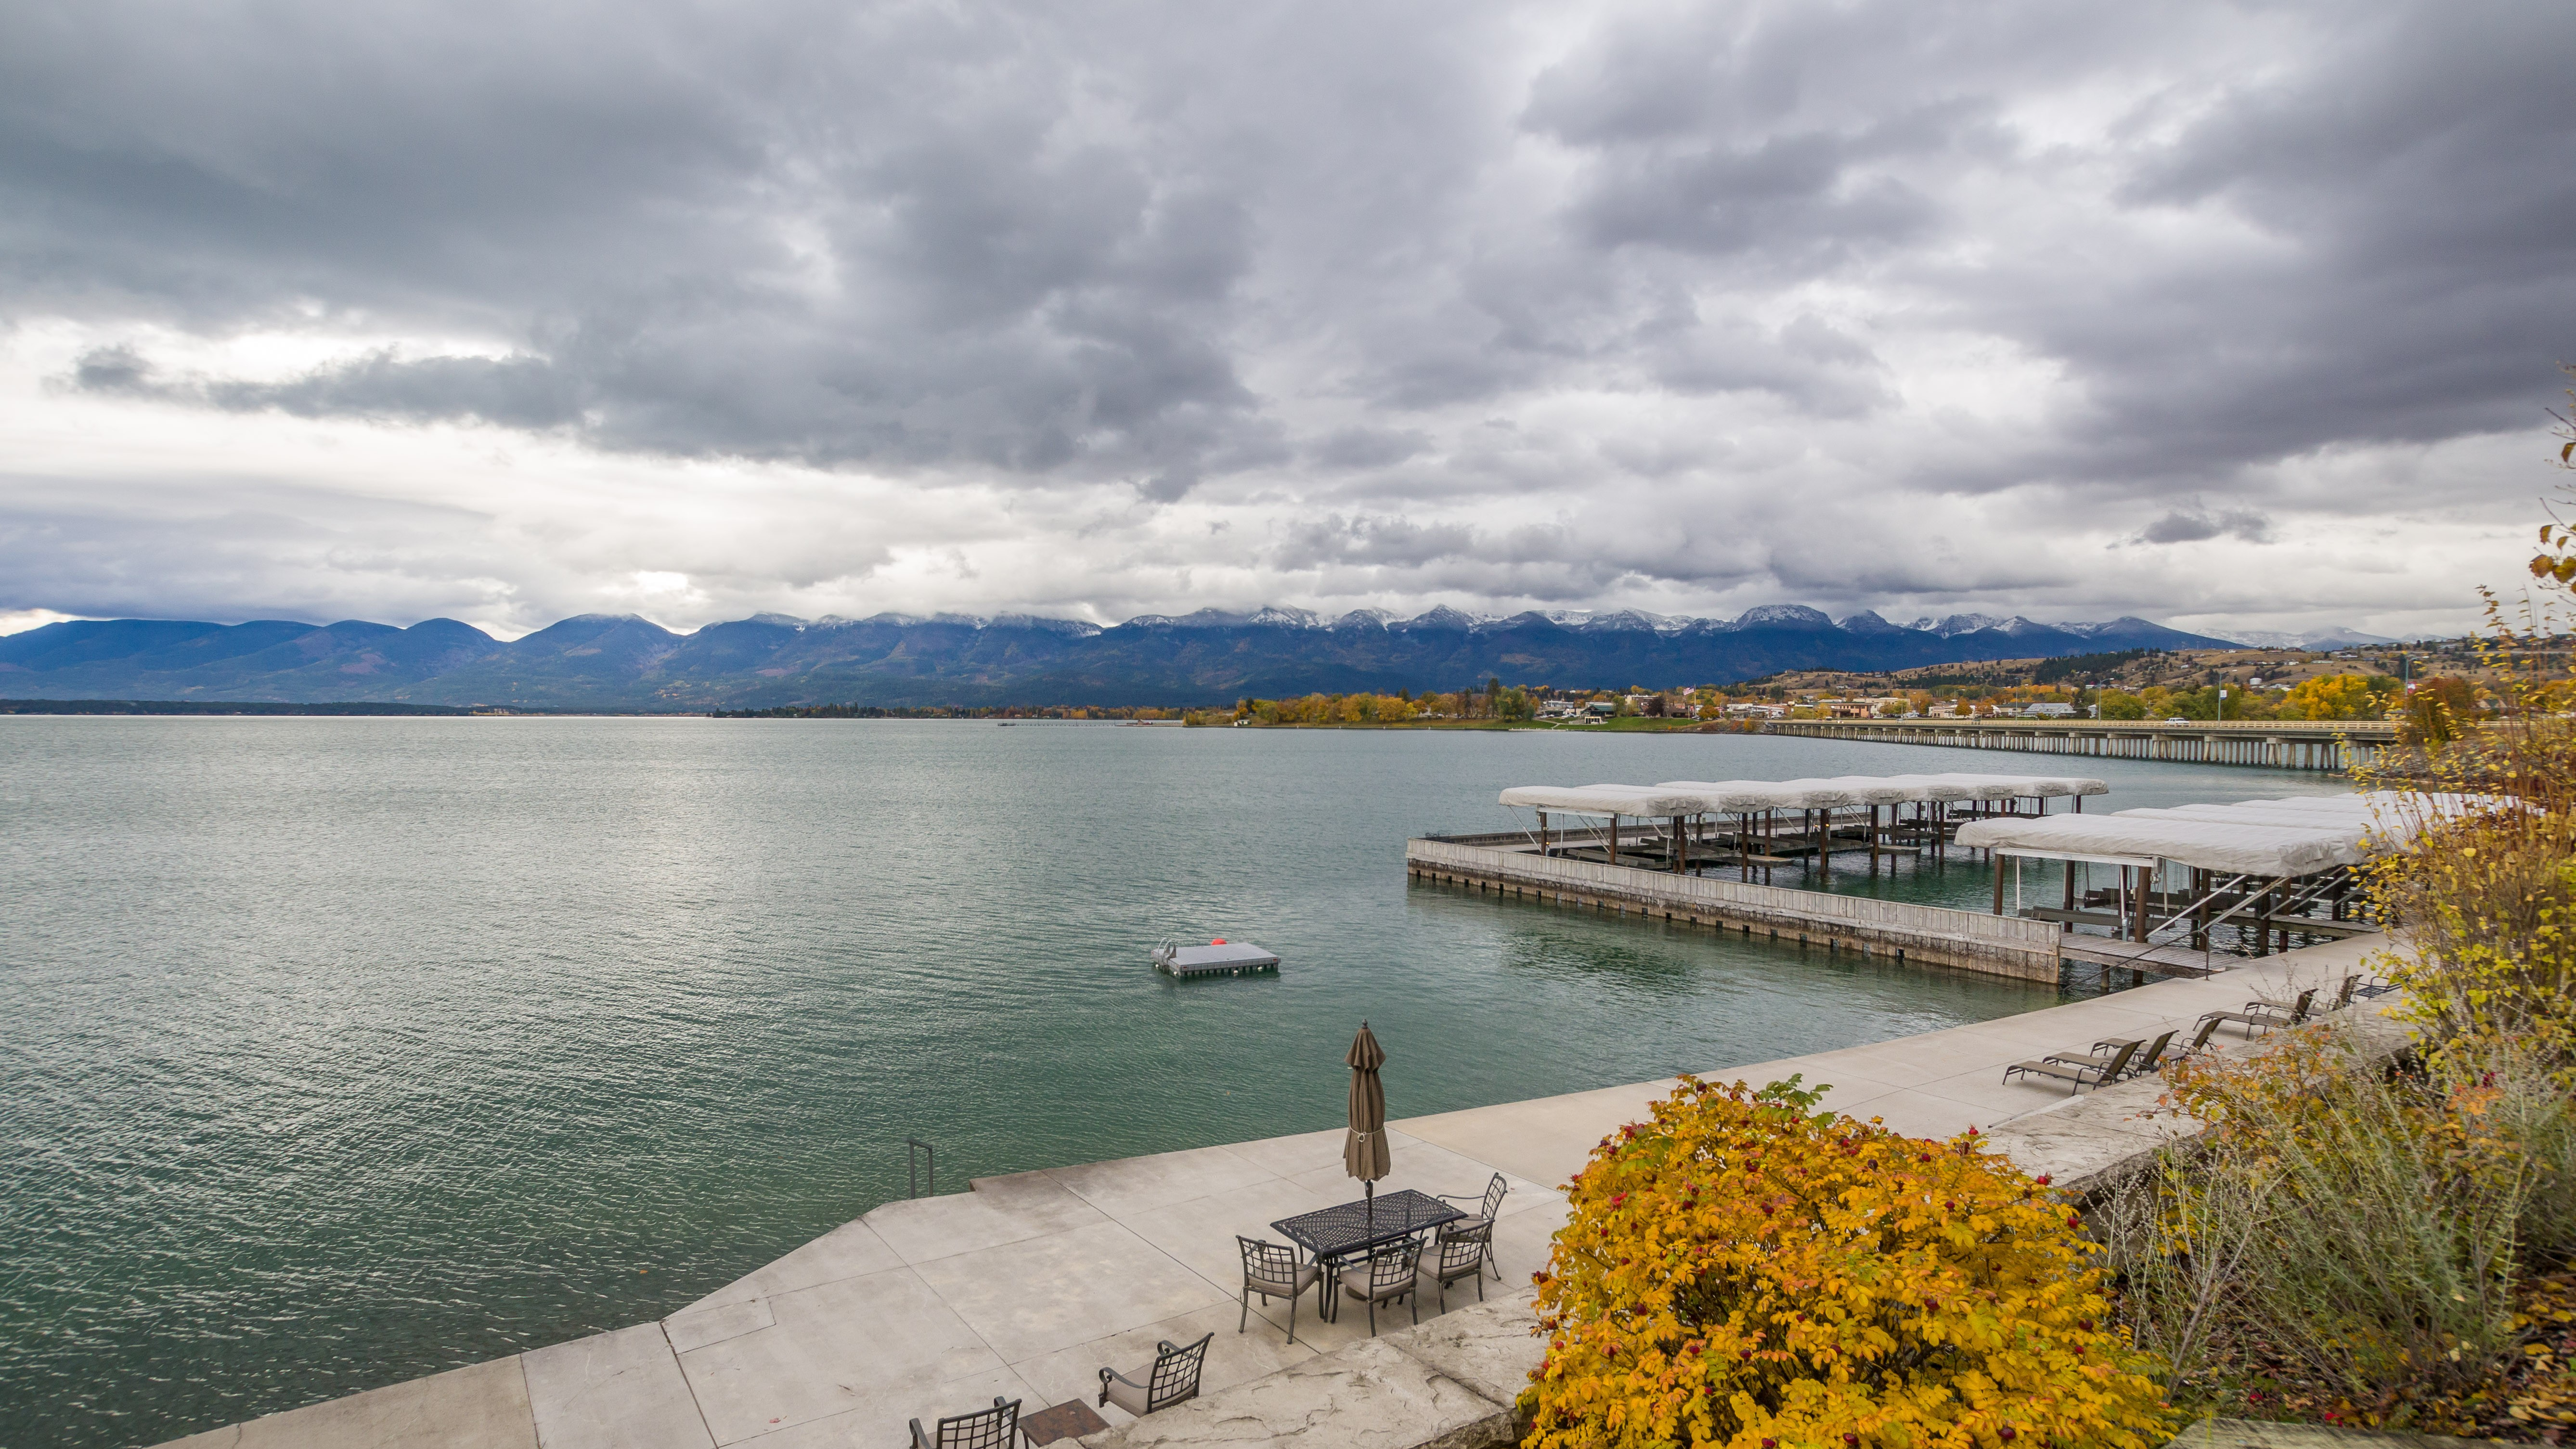 Condominium for Sale at 202 Shoreline Dr , Polson, MT 59860 202 Shoreline Dr Polson, Montana, 59860 United States